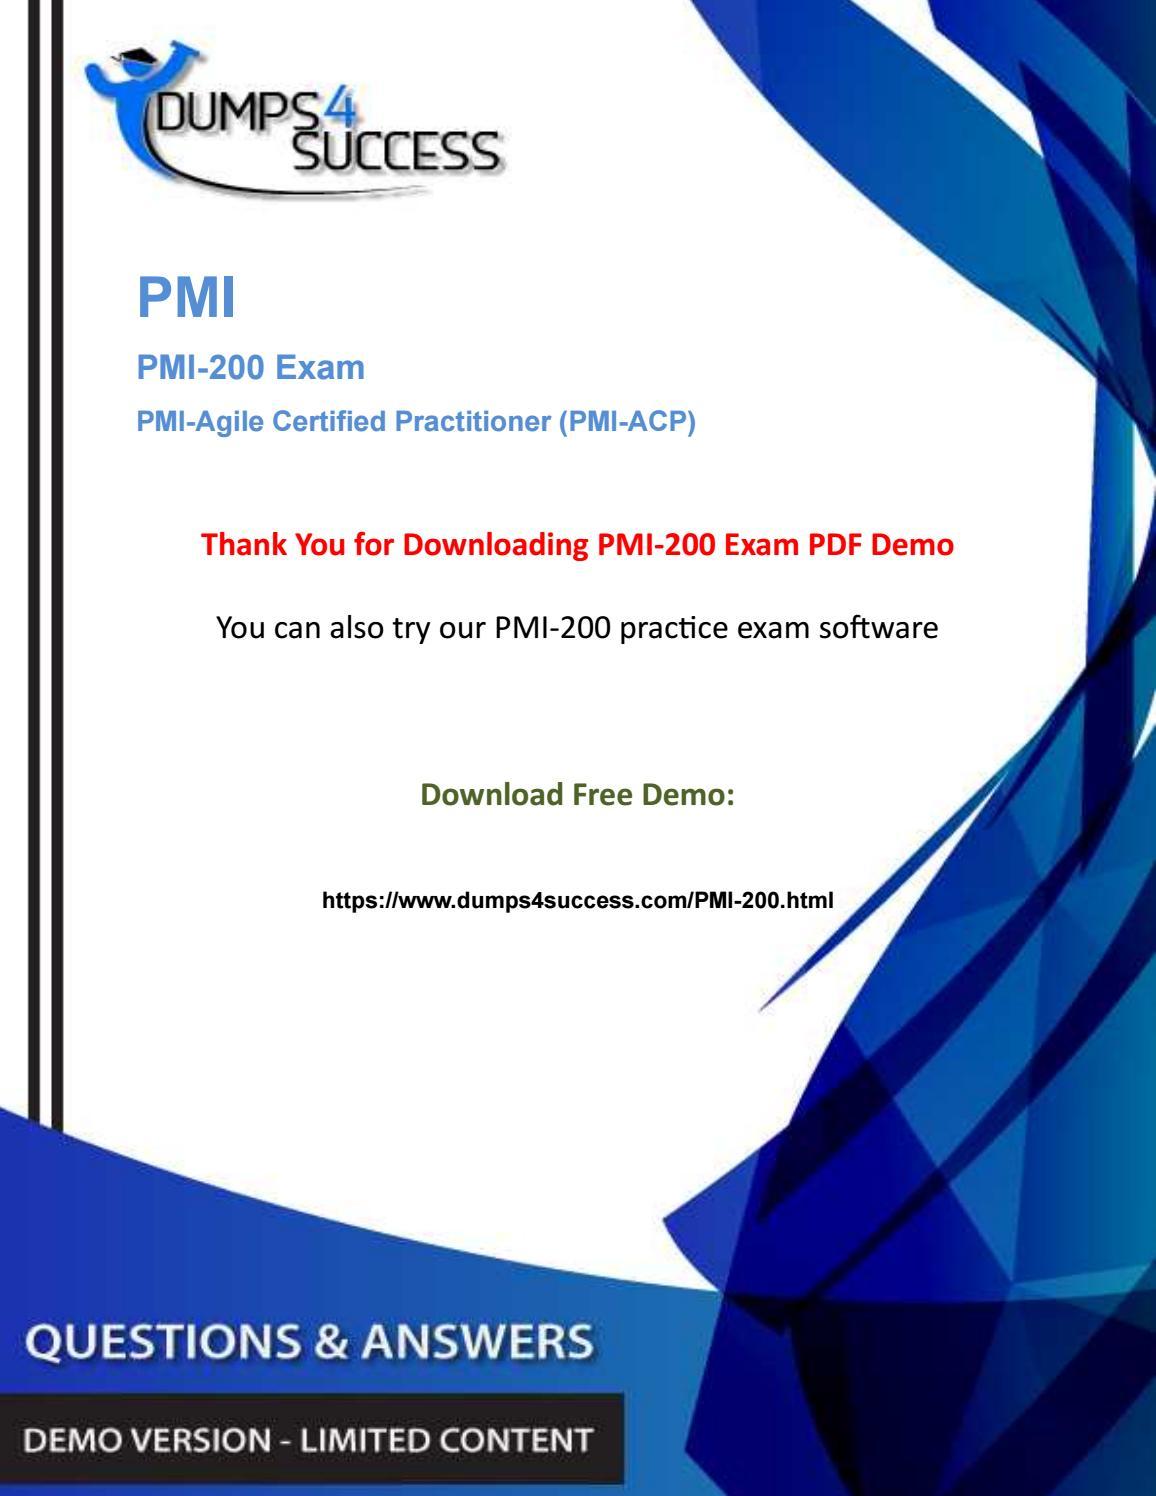 Pmi Agile Certified Practitioner Pmi Acp Pmi 200 Exam Questions